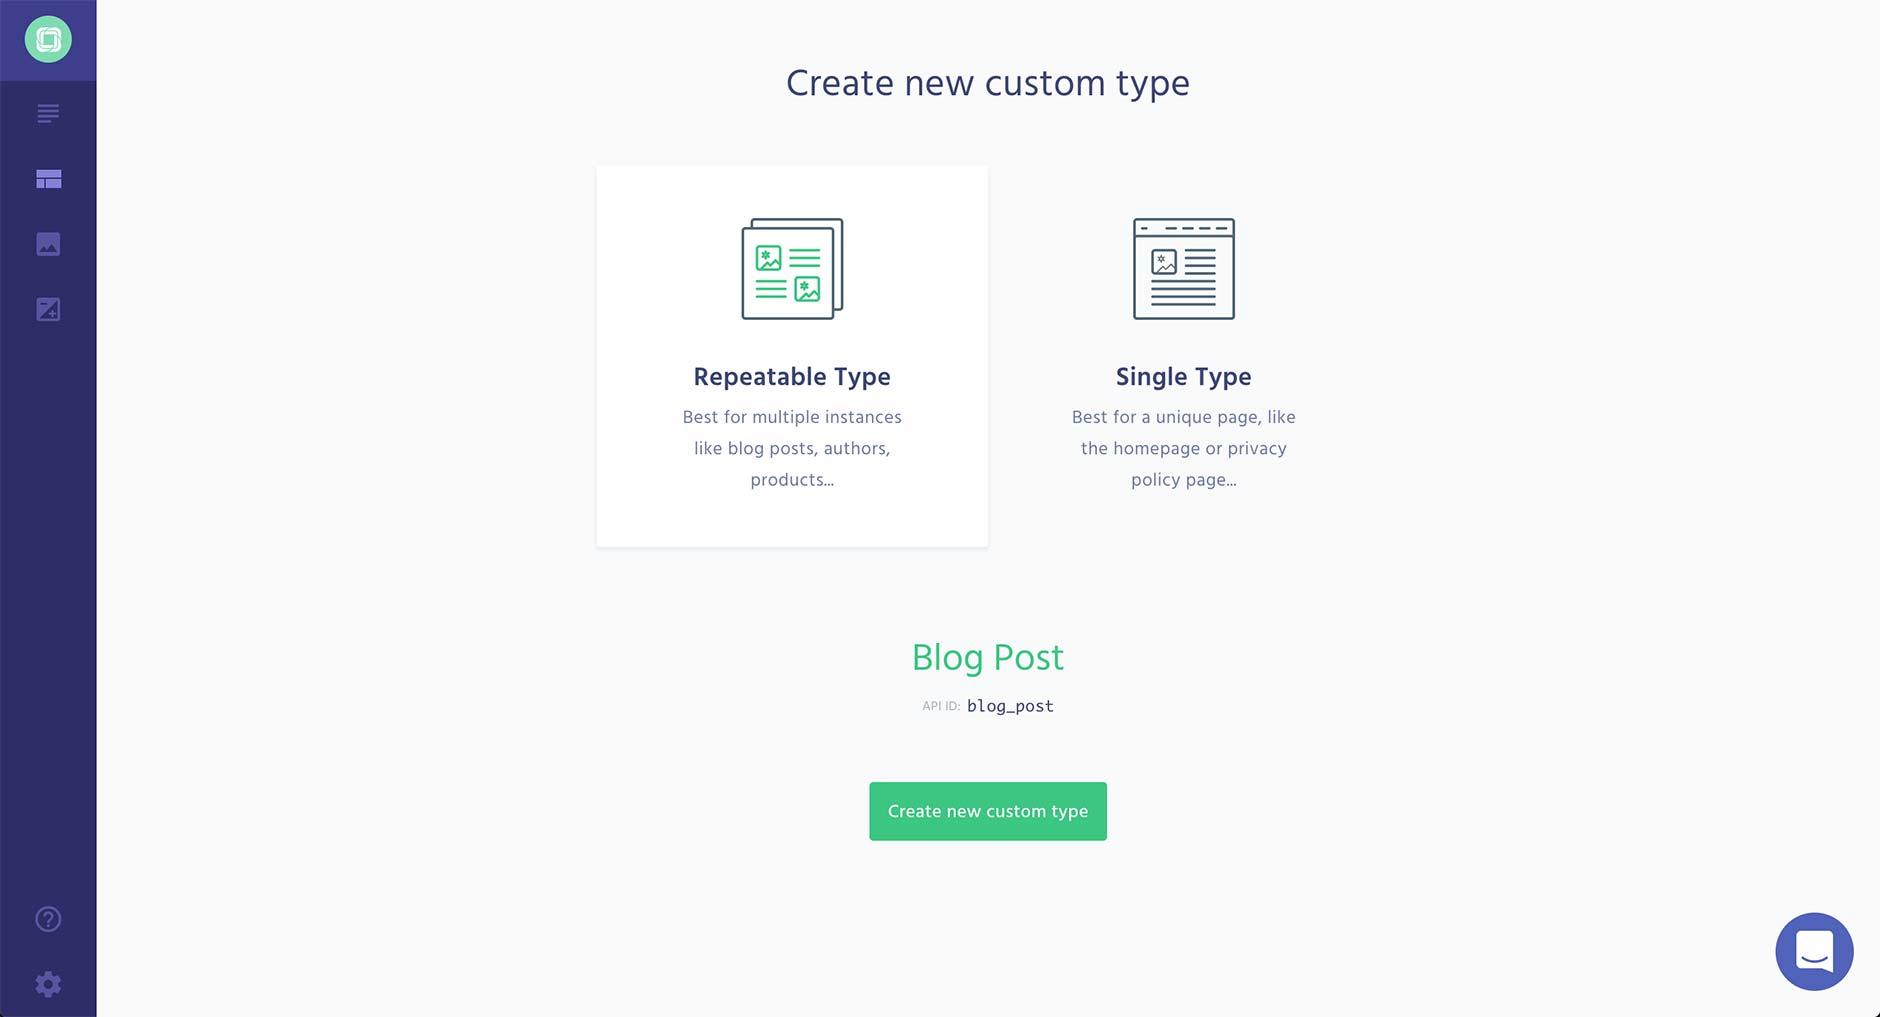 Crear un nuevo custom type